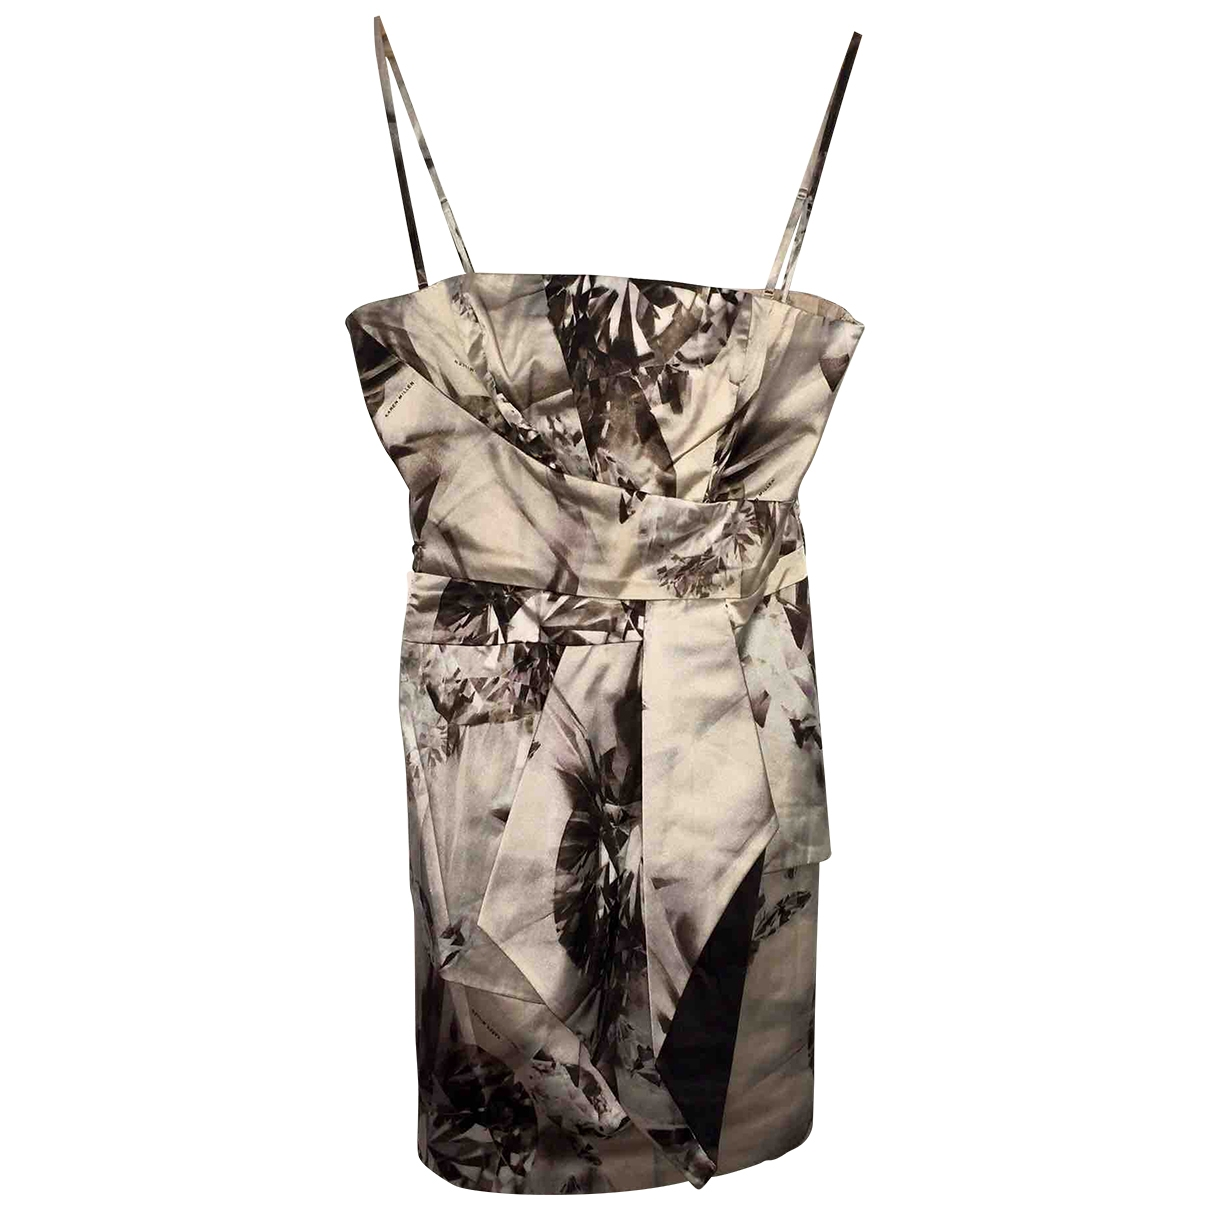 Karen Millen \N Beige Silk dress for Women 42 FR